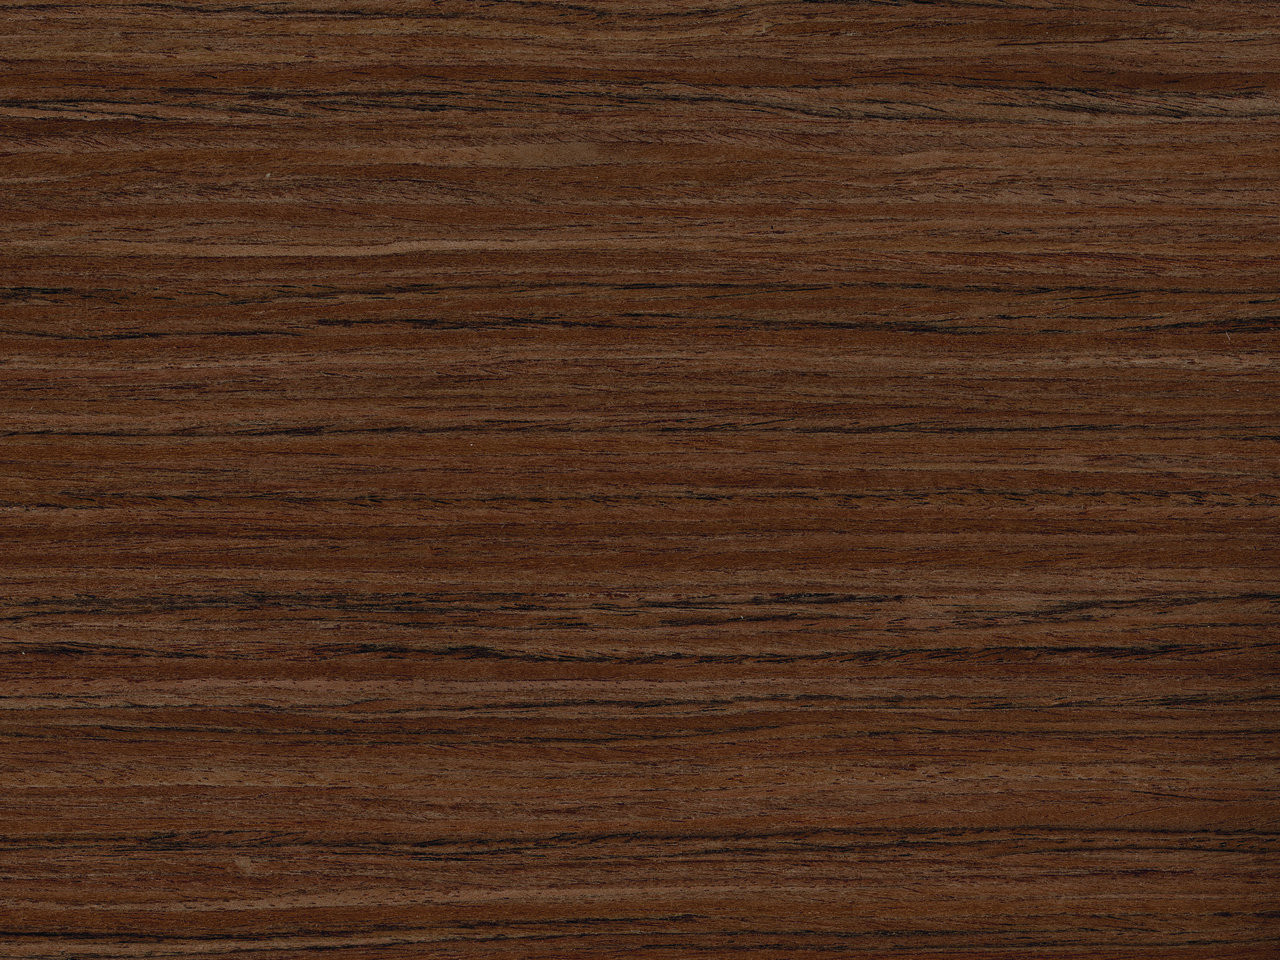 Reconstituted teak wood veneer qtr tk s